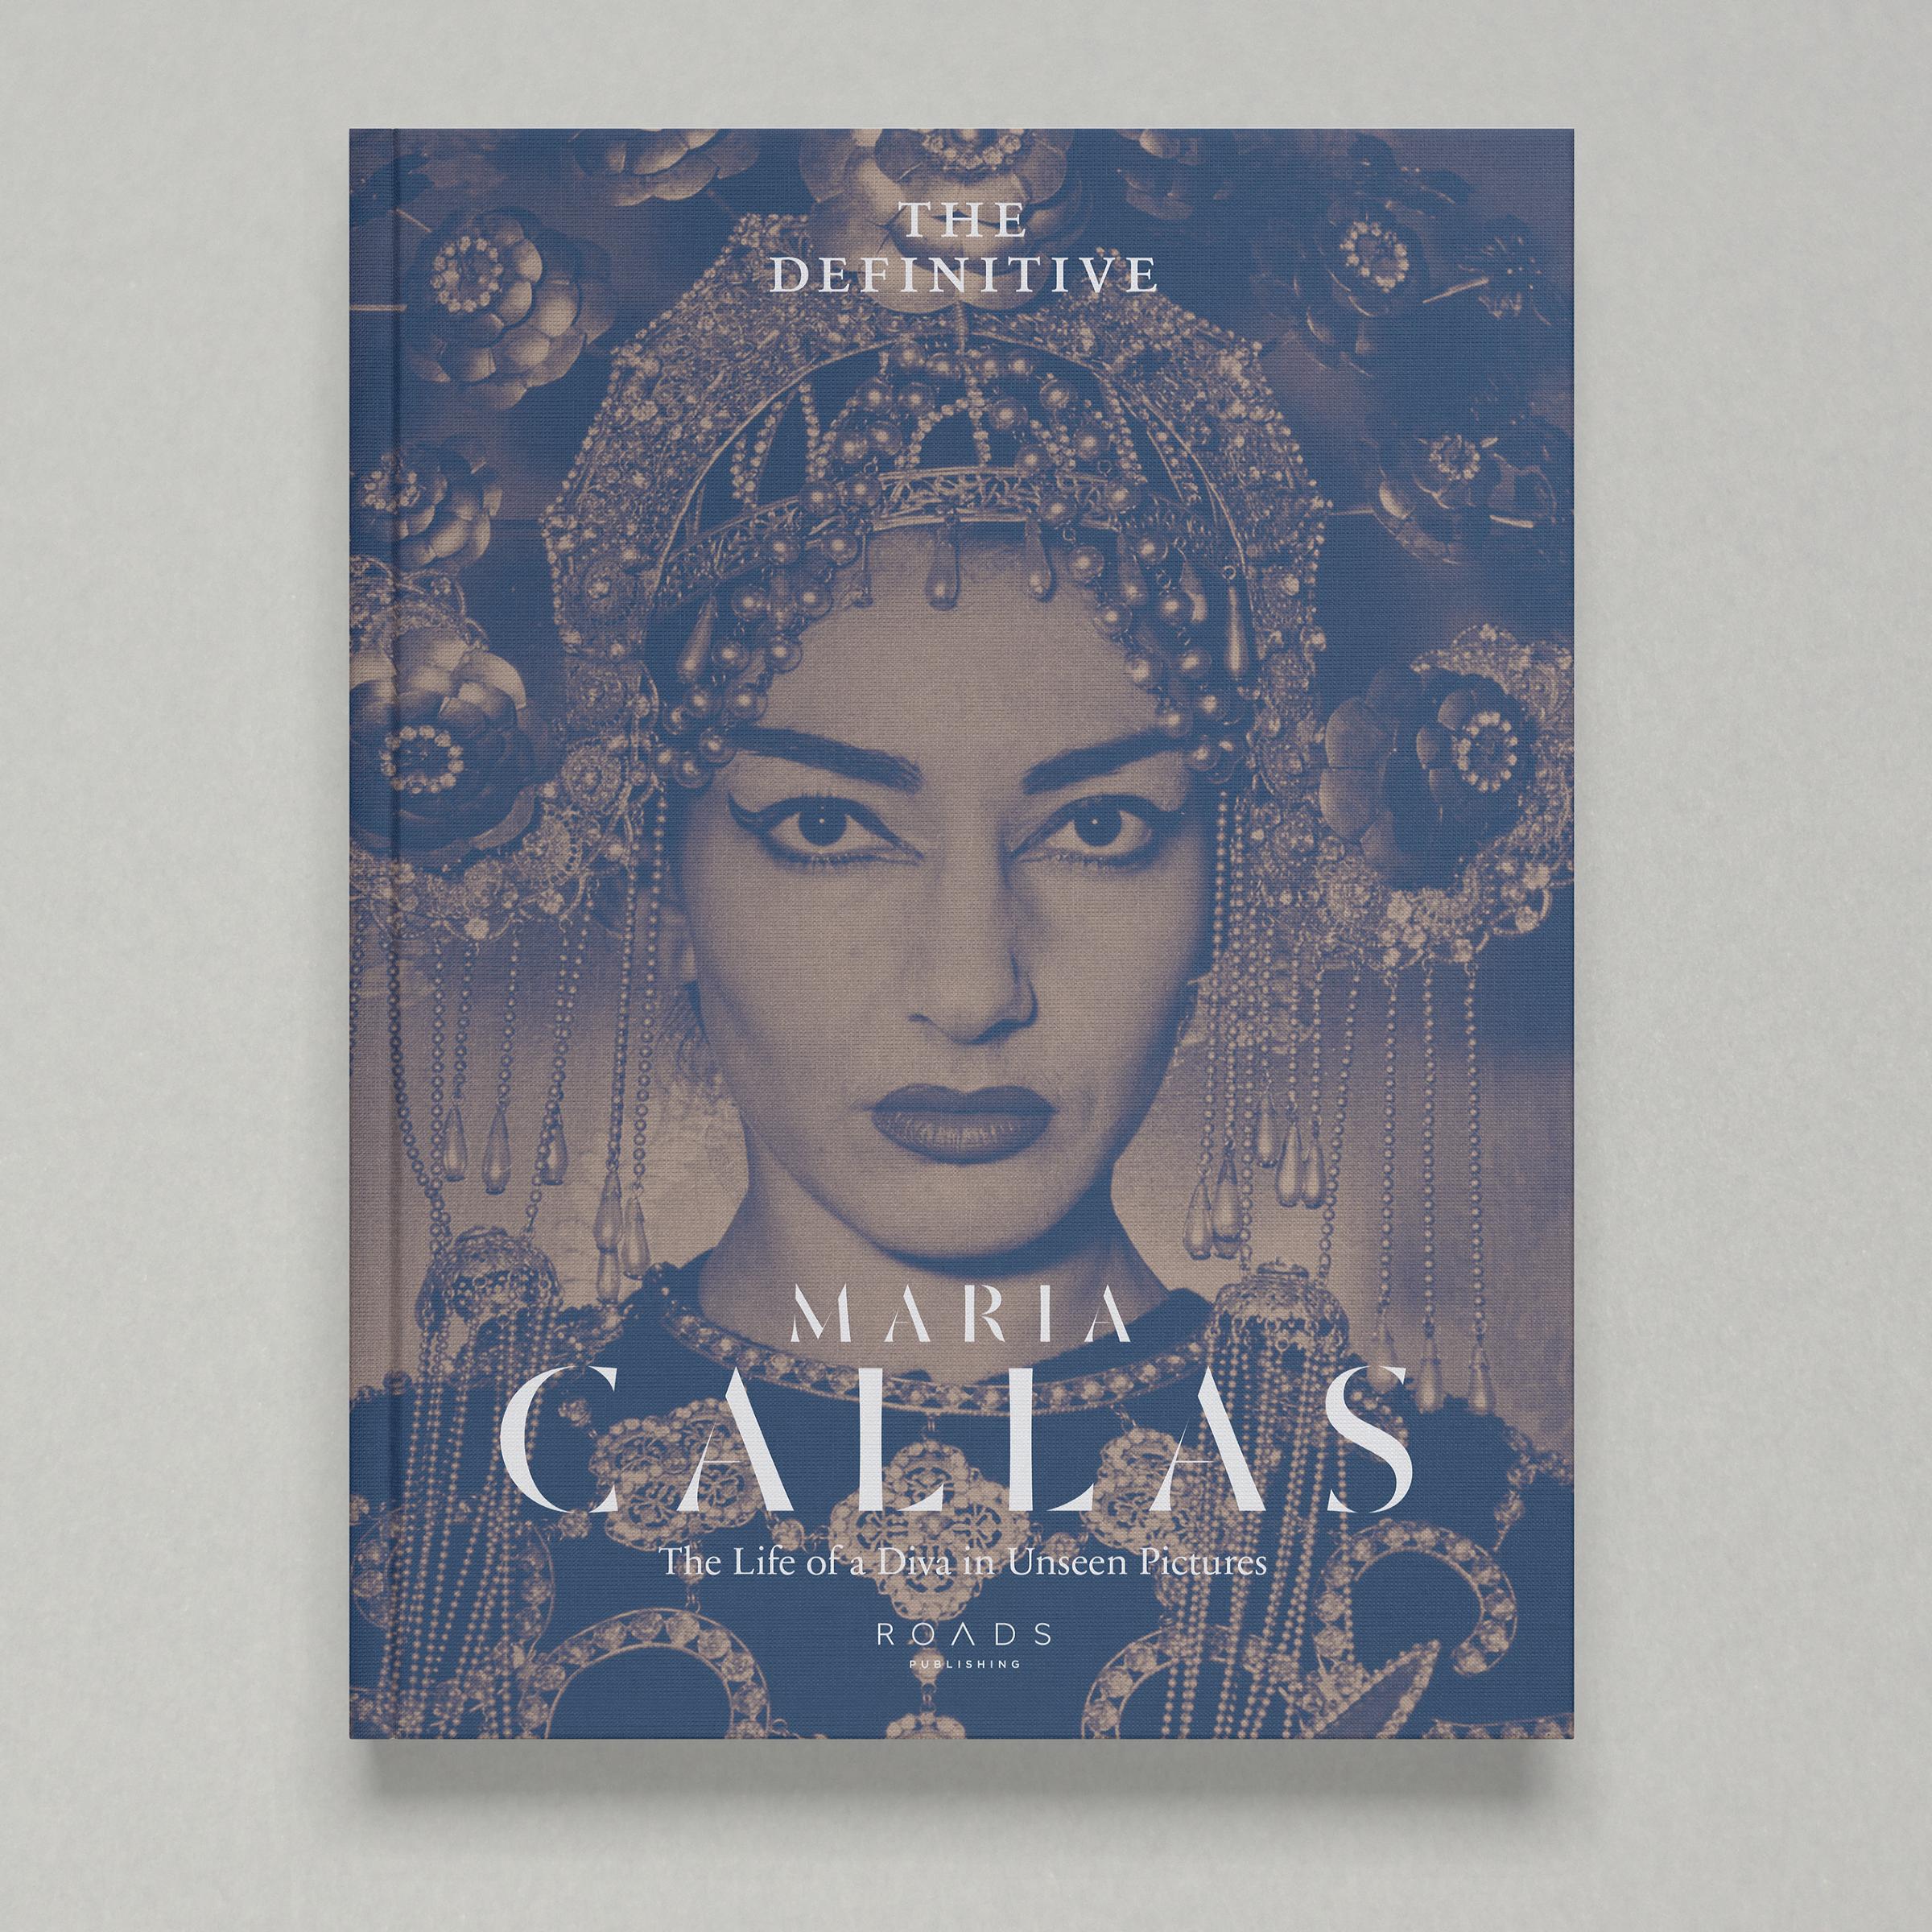 Cover image: The Definitive Maria Callas